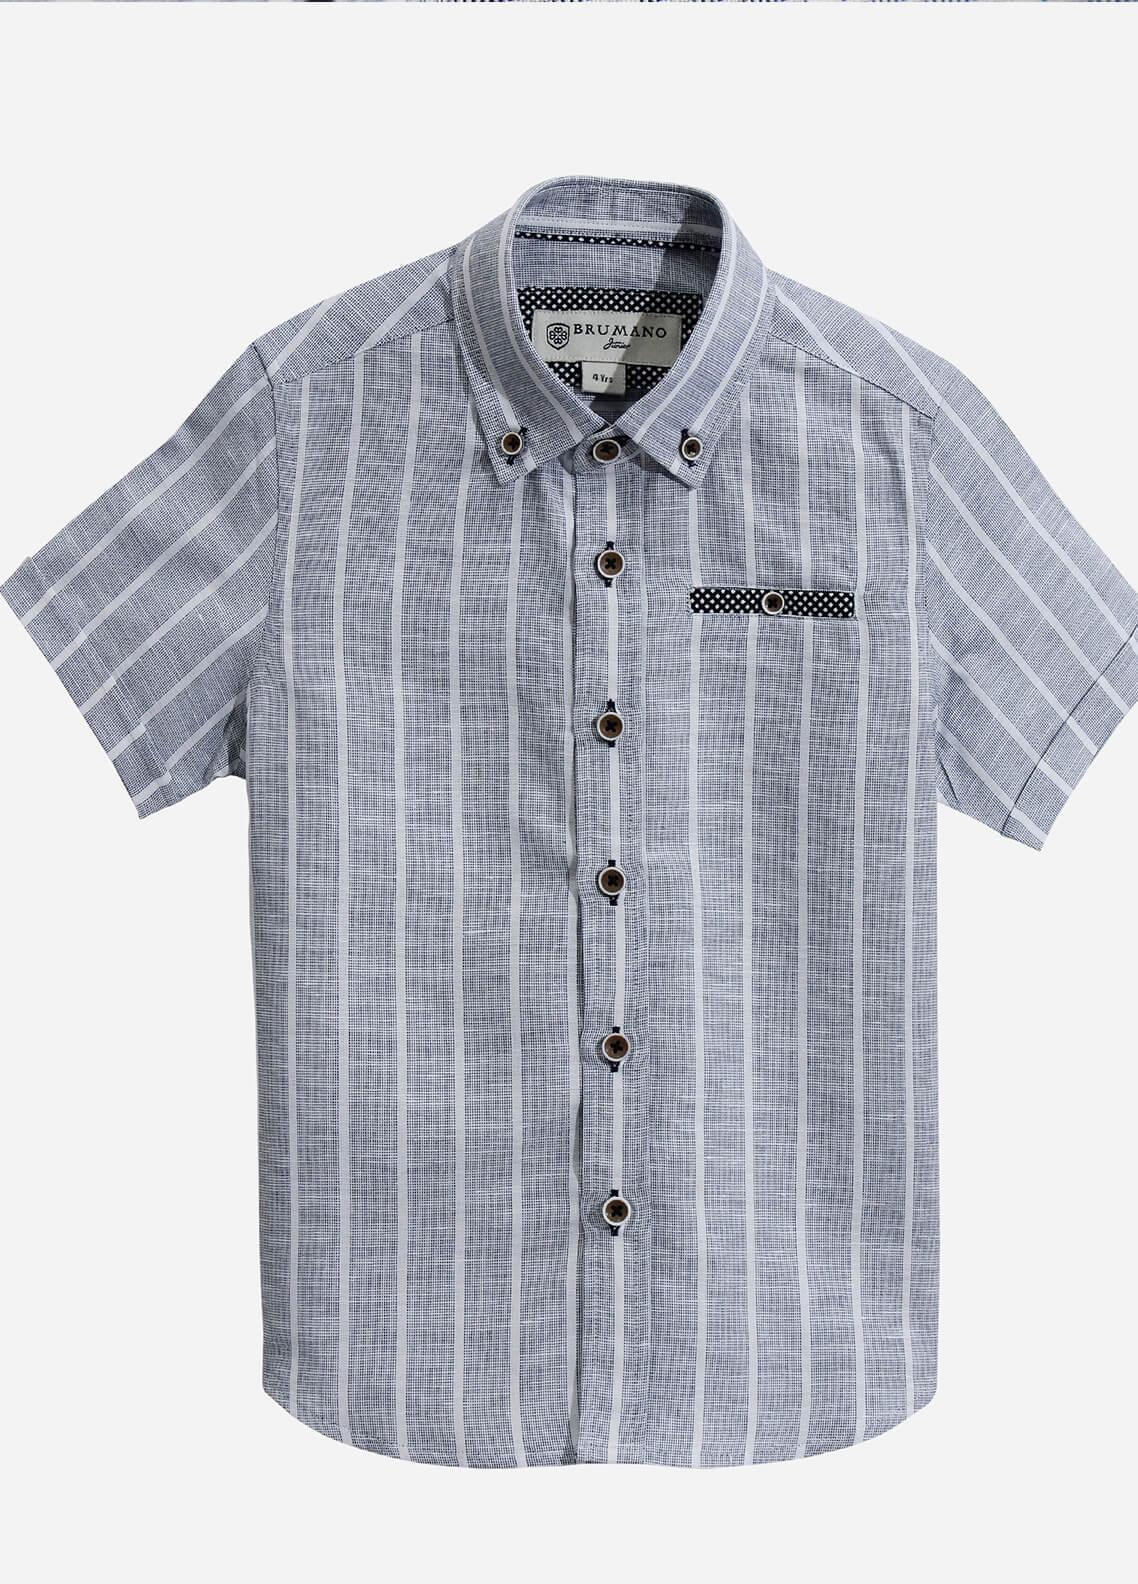 Brumano Cotton Casual Boys Shirts - Blue BRM-600